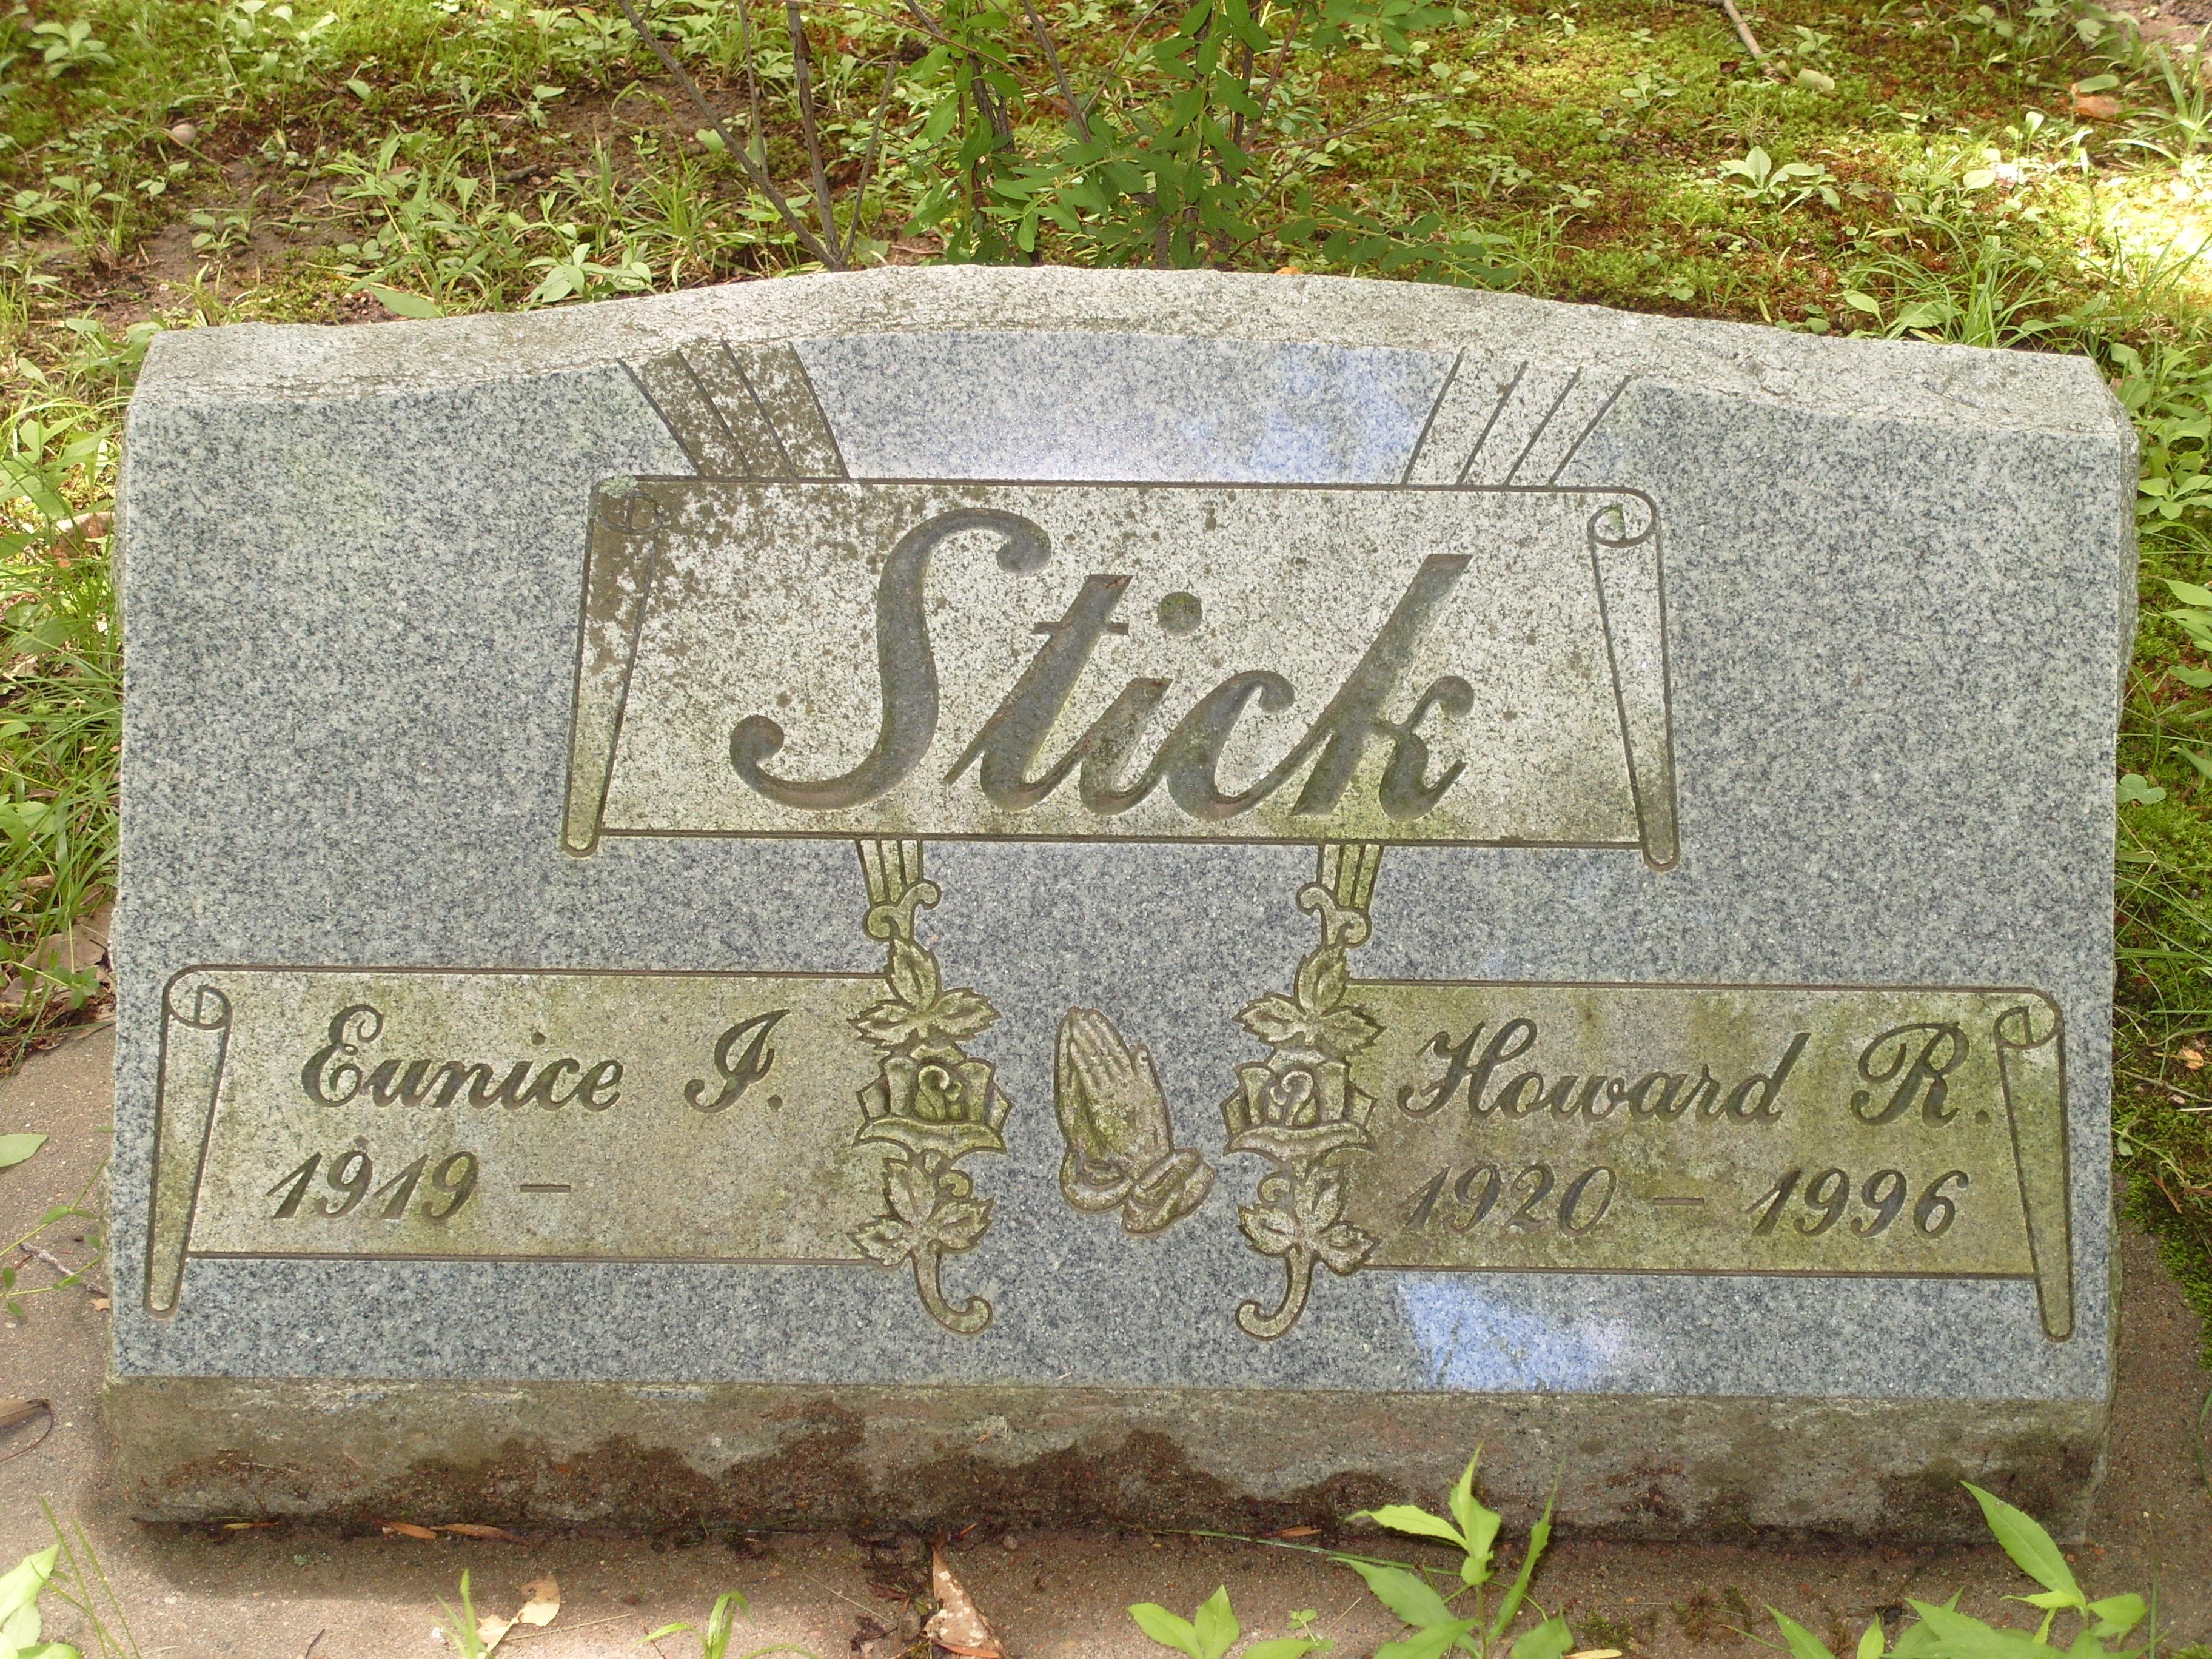 Eunice J. Stick